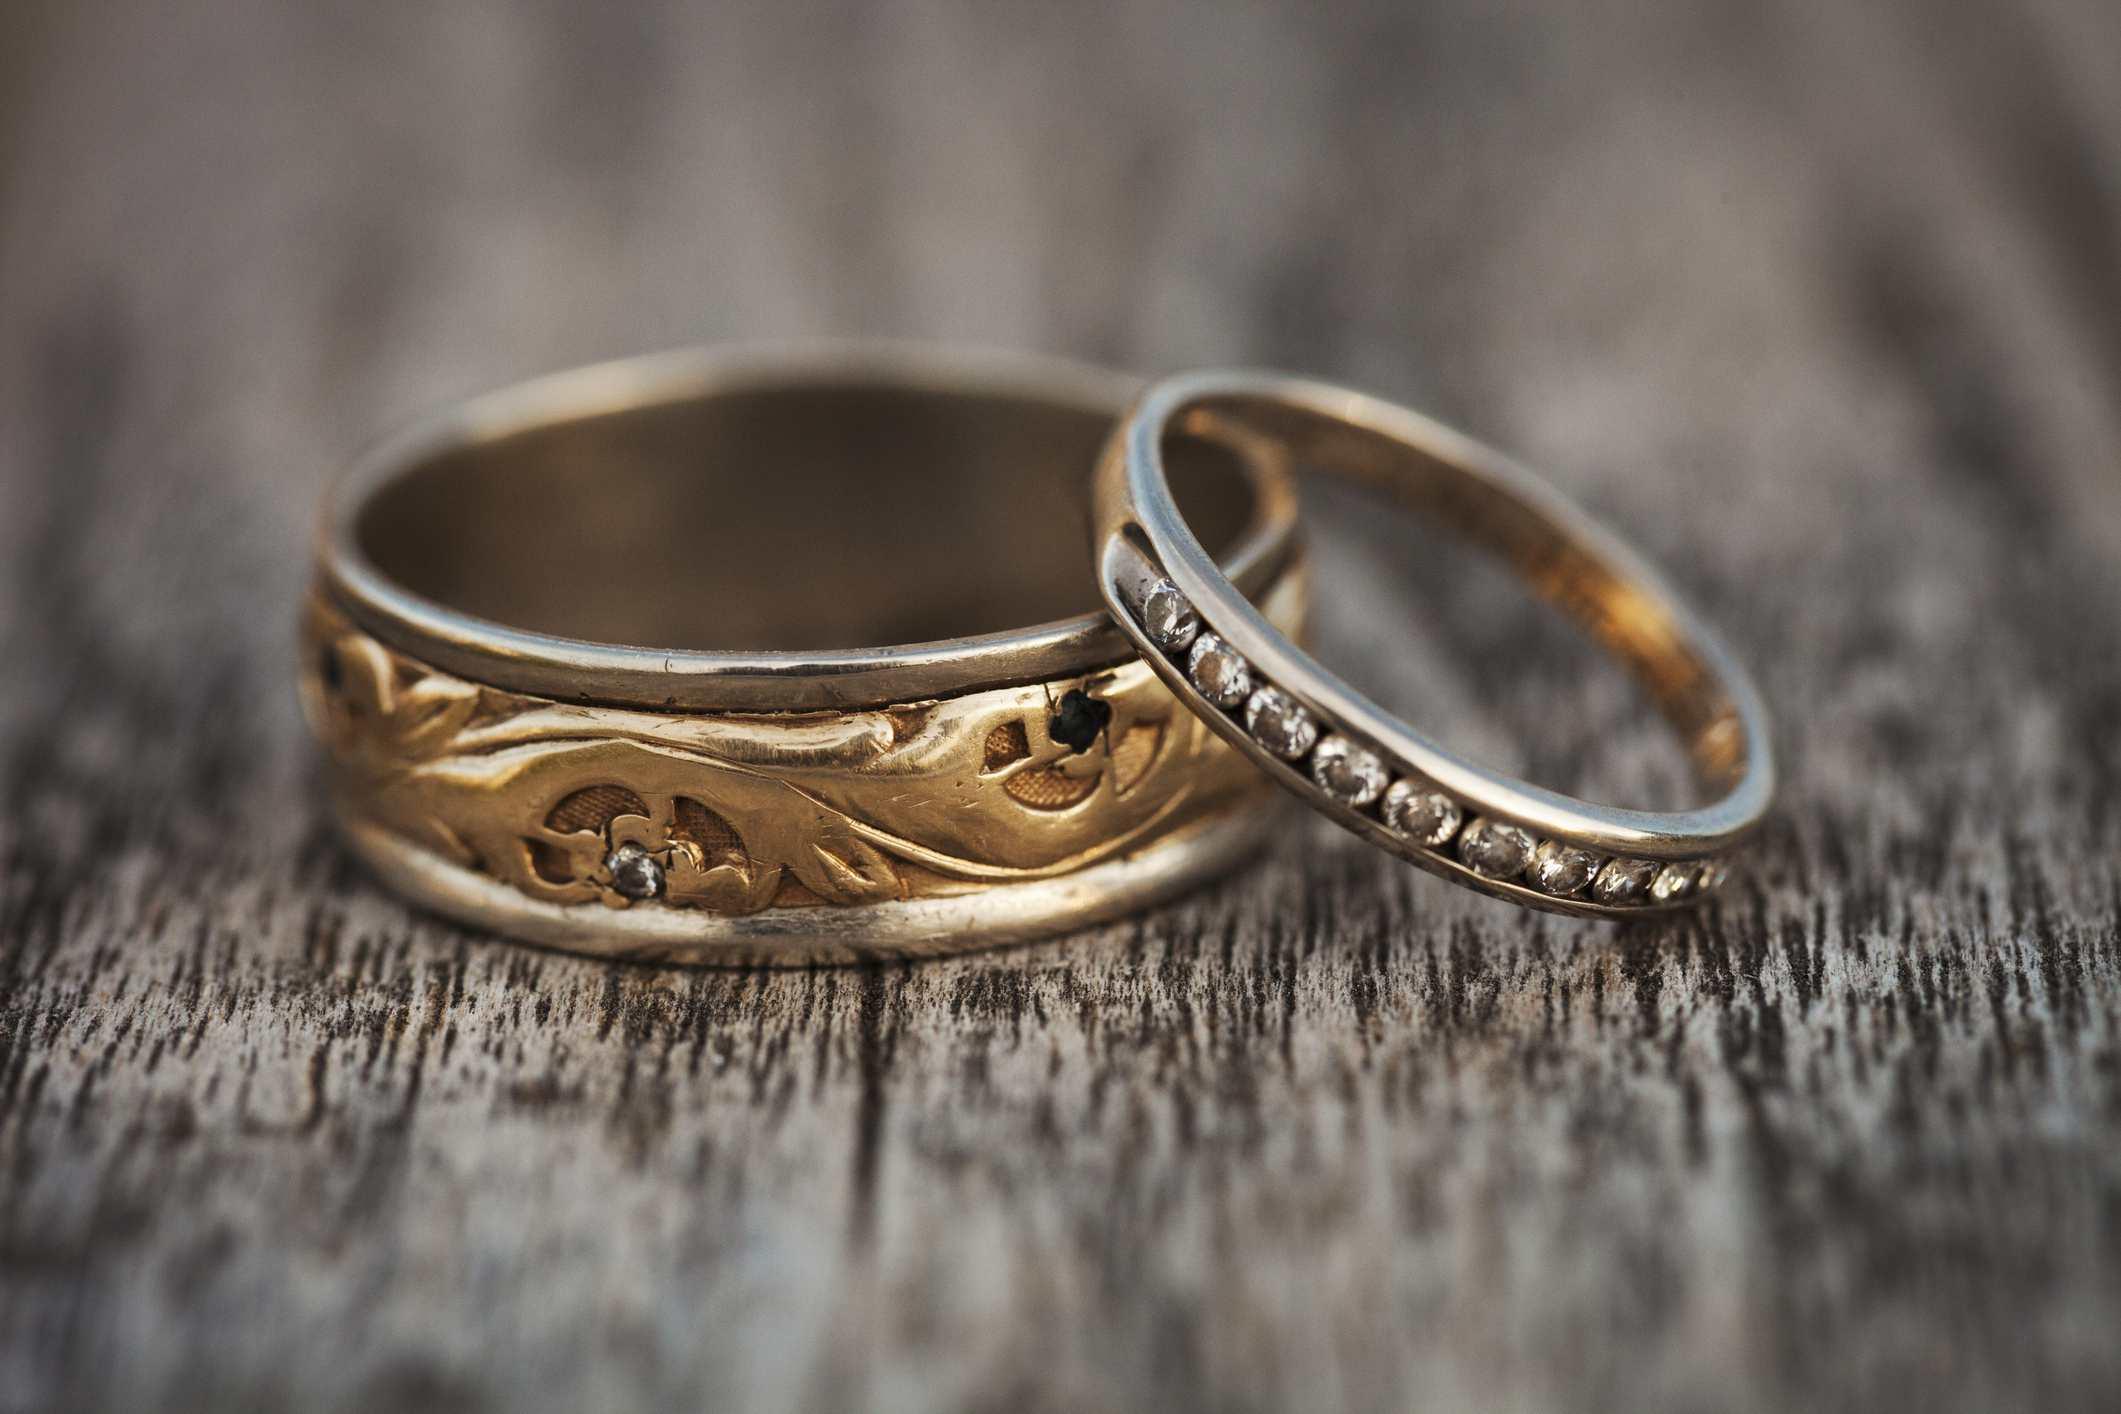 Jewelry anniversary gift ideas